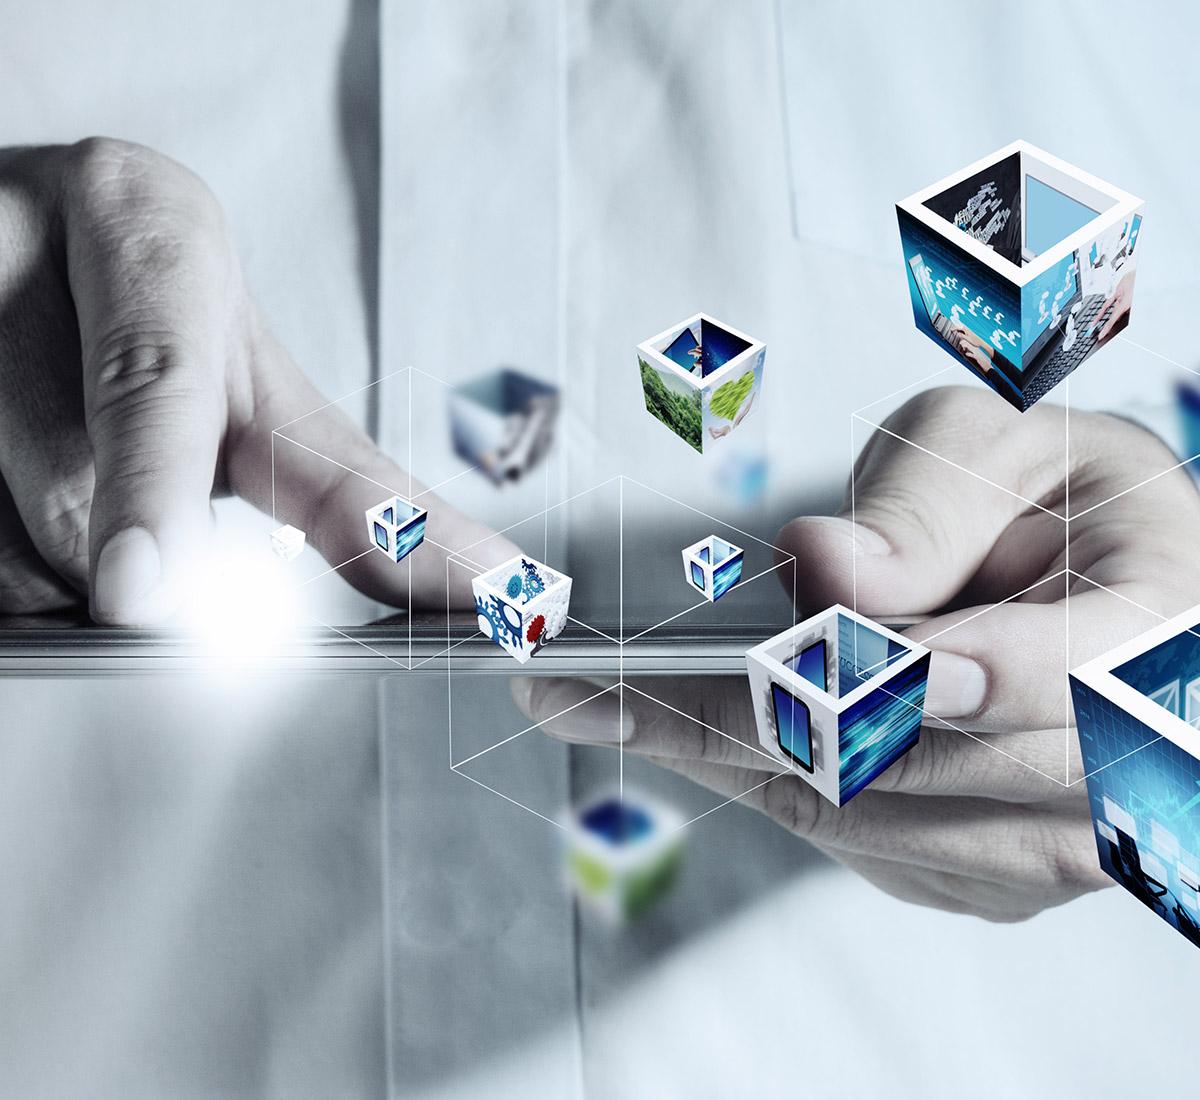 plateforme service digitaux immobilier interoperable sopra steria